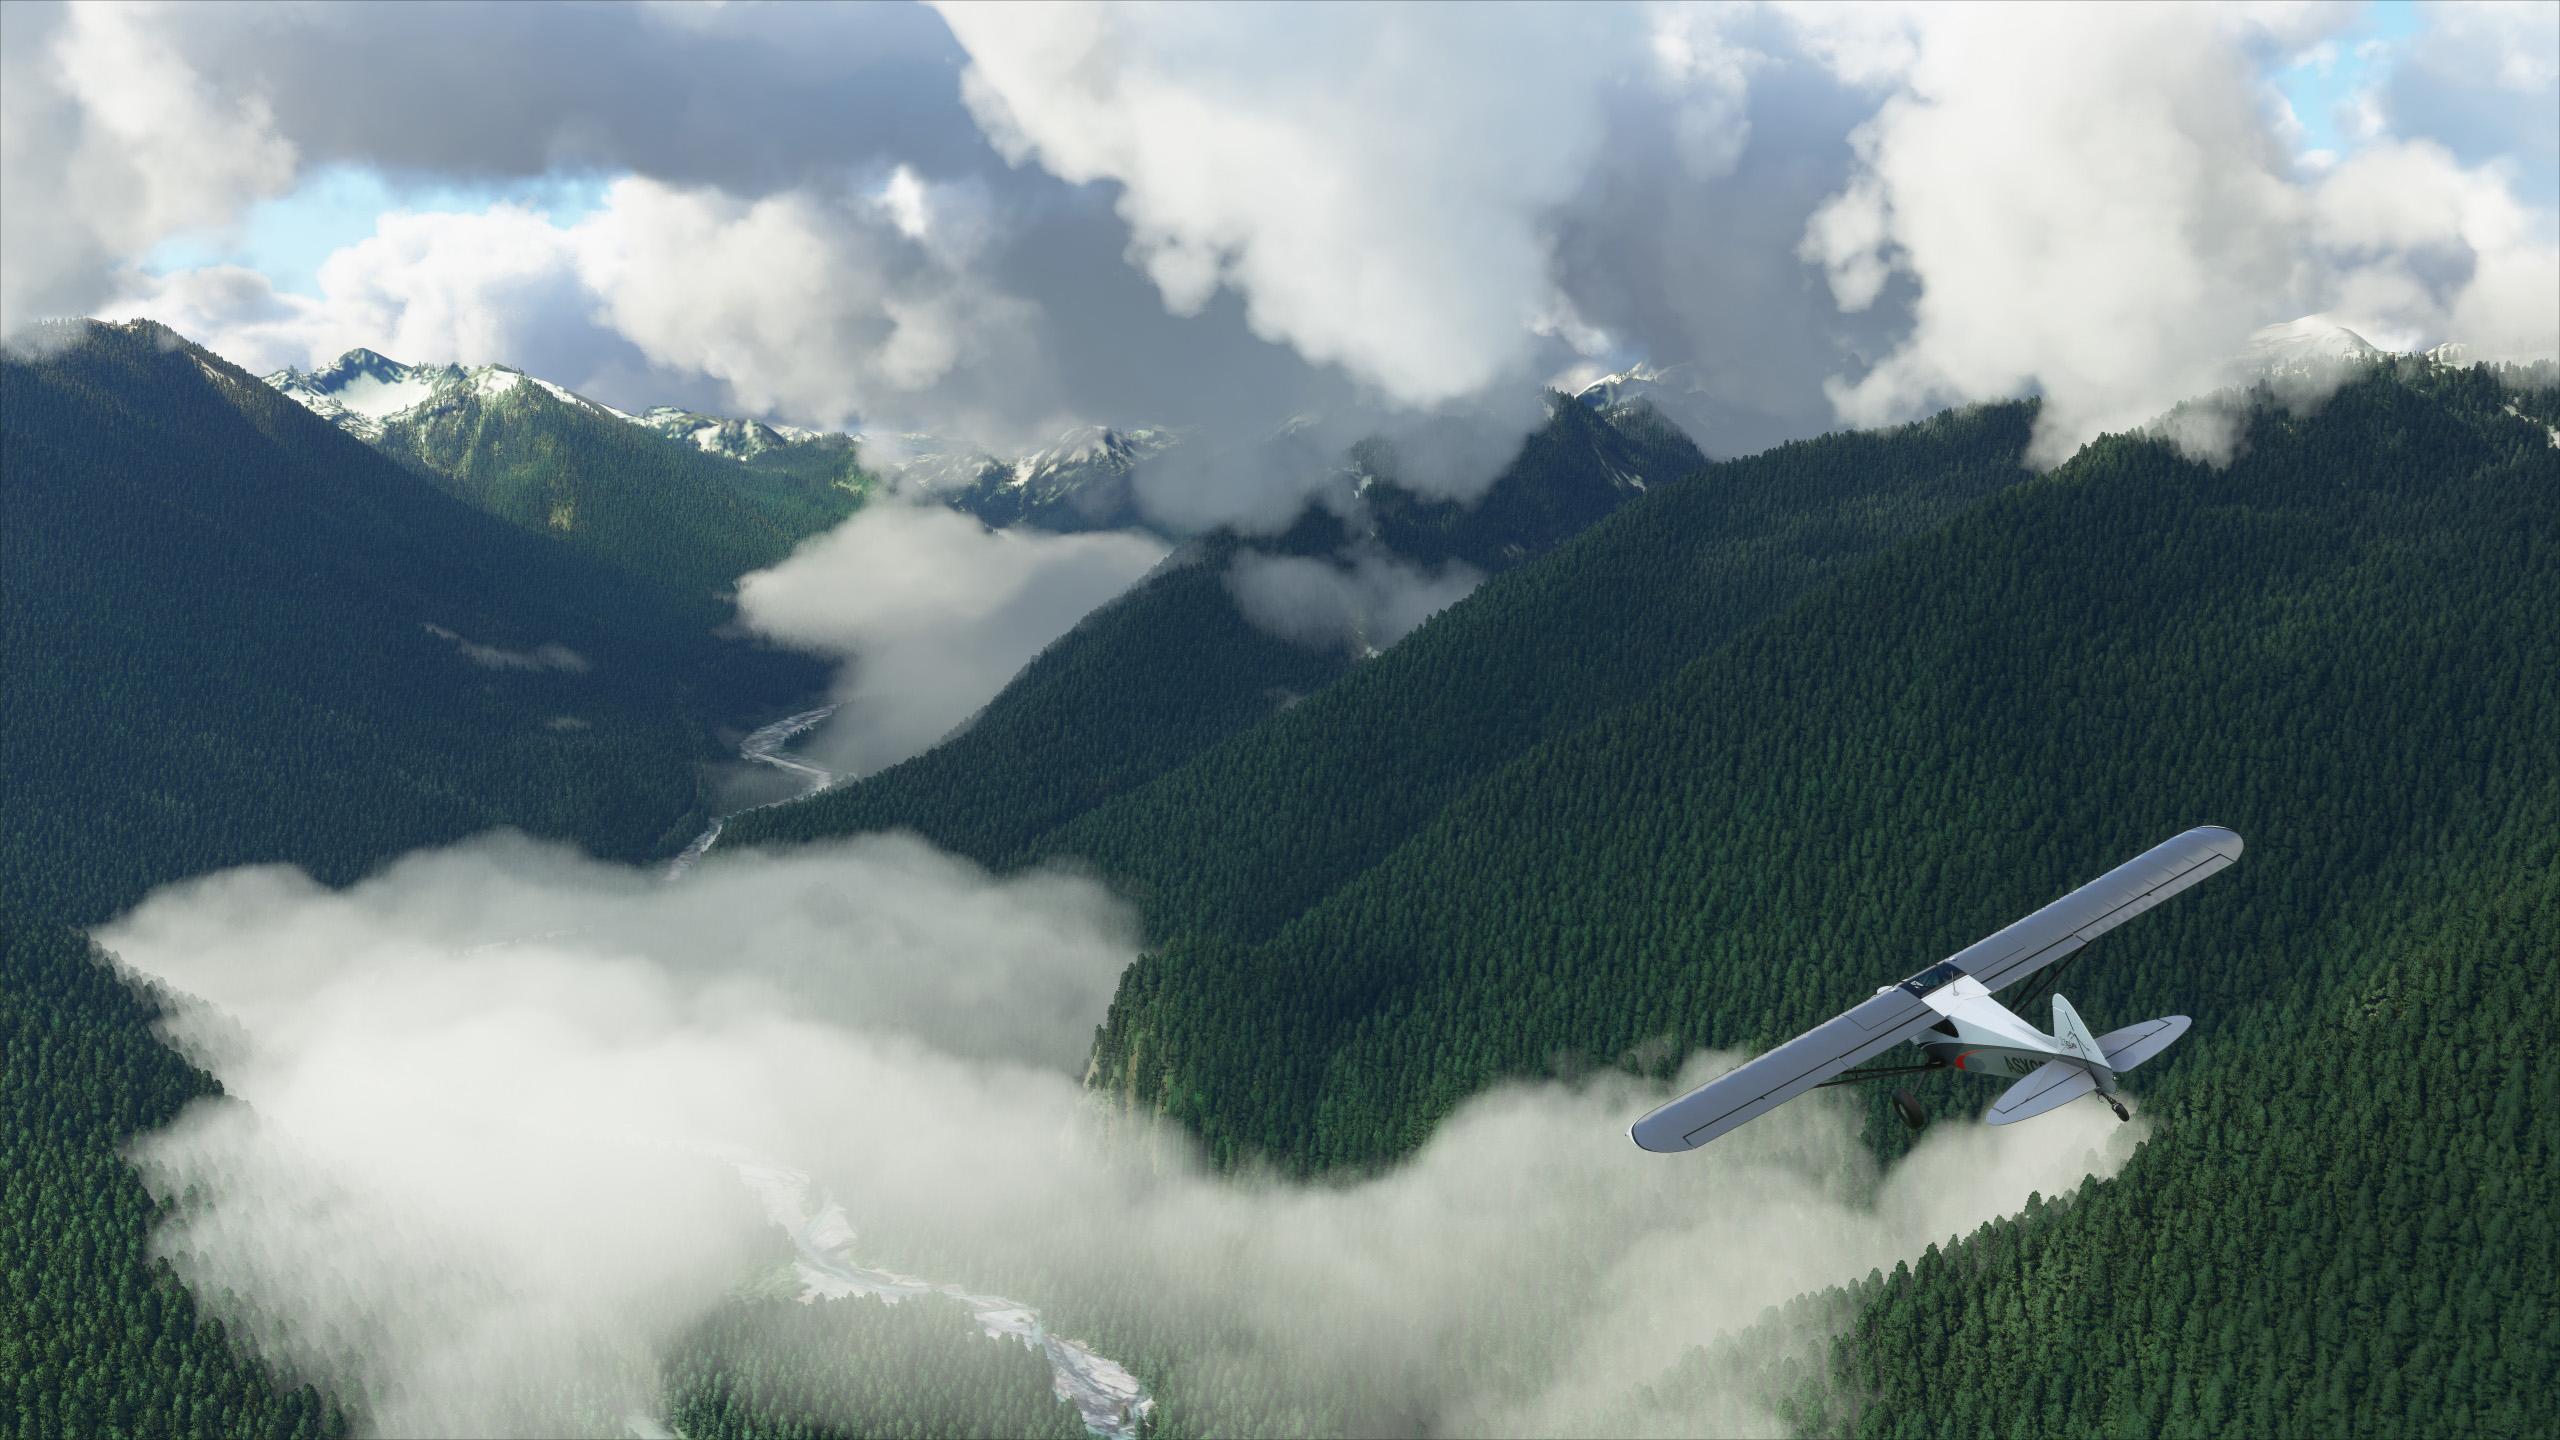 microsoft flight simulator 2020 data usage